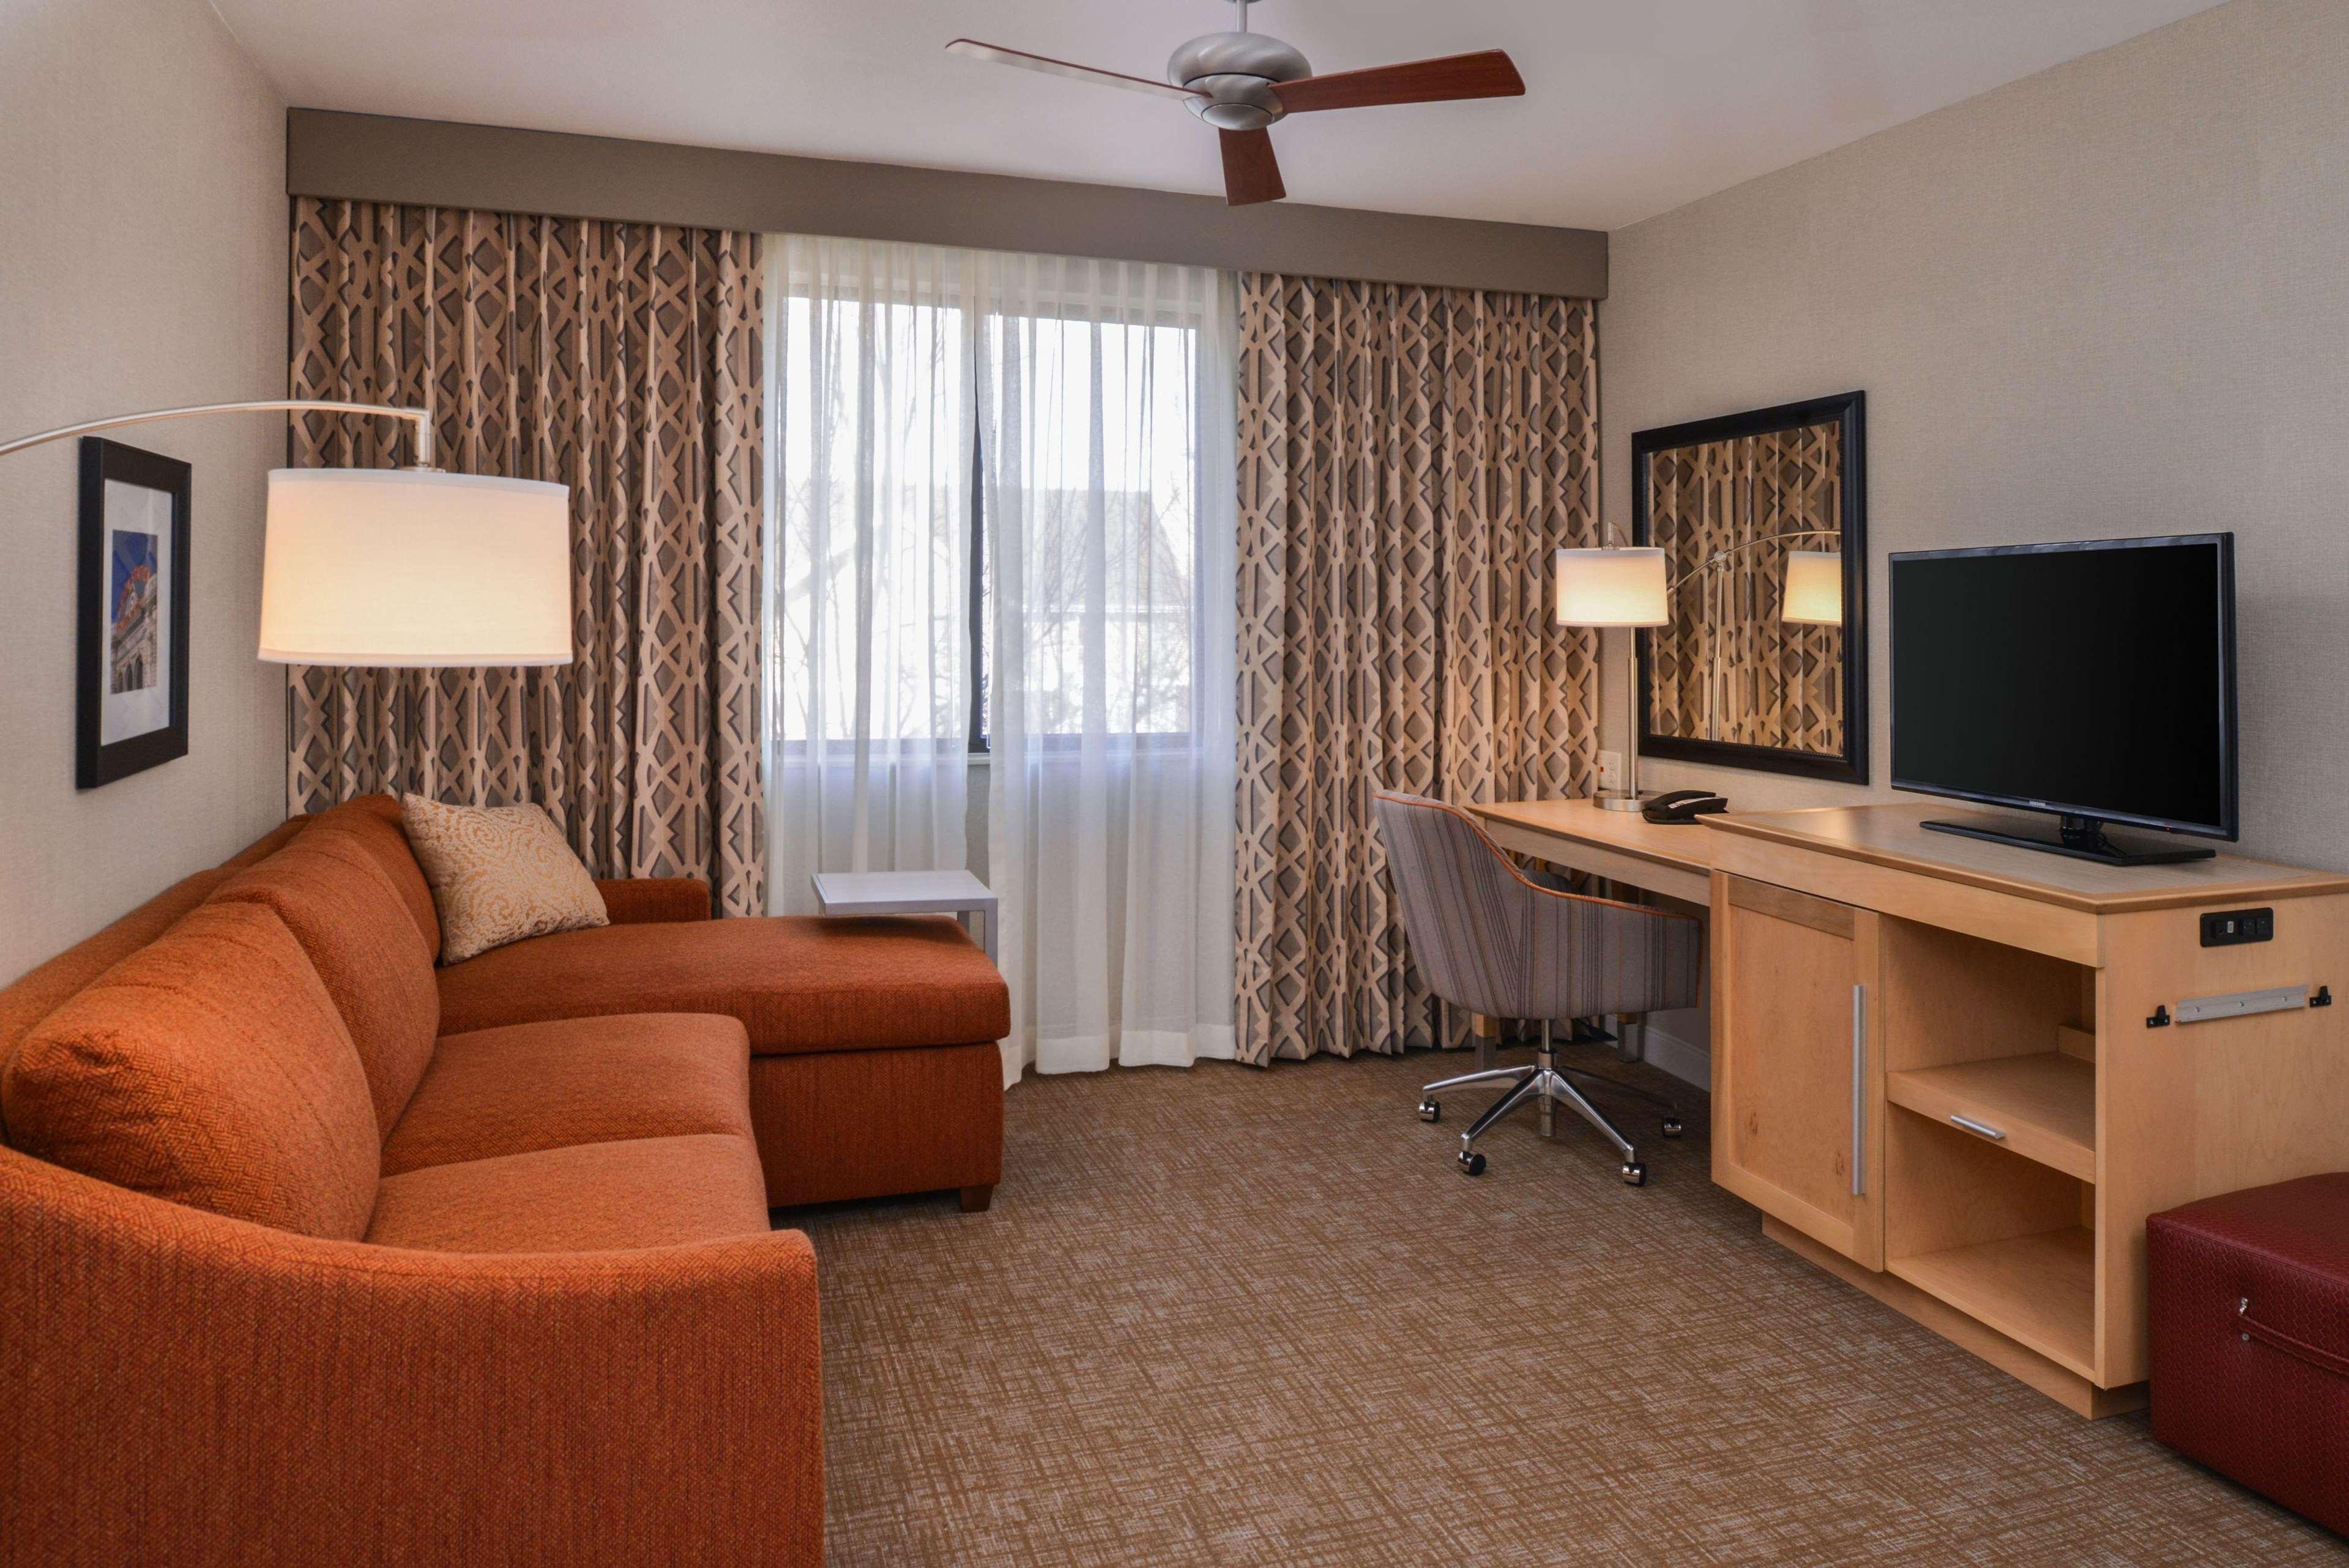 Hampton Inn & Suites Denver-Speer Boulevard image 32